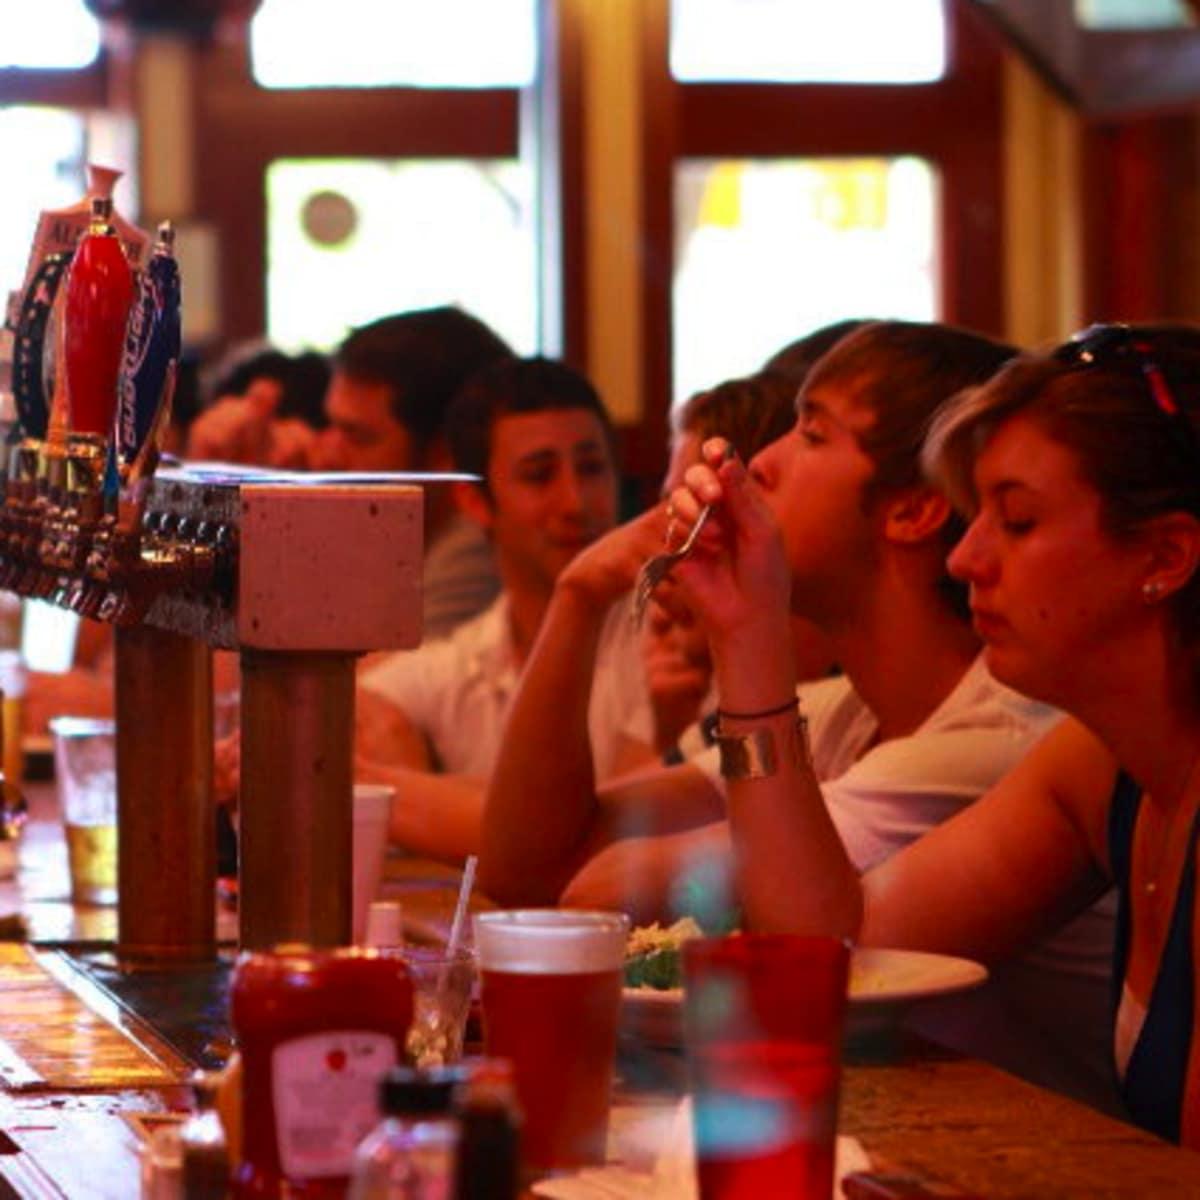 Austin_photo: places_food_the tavern_interior